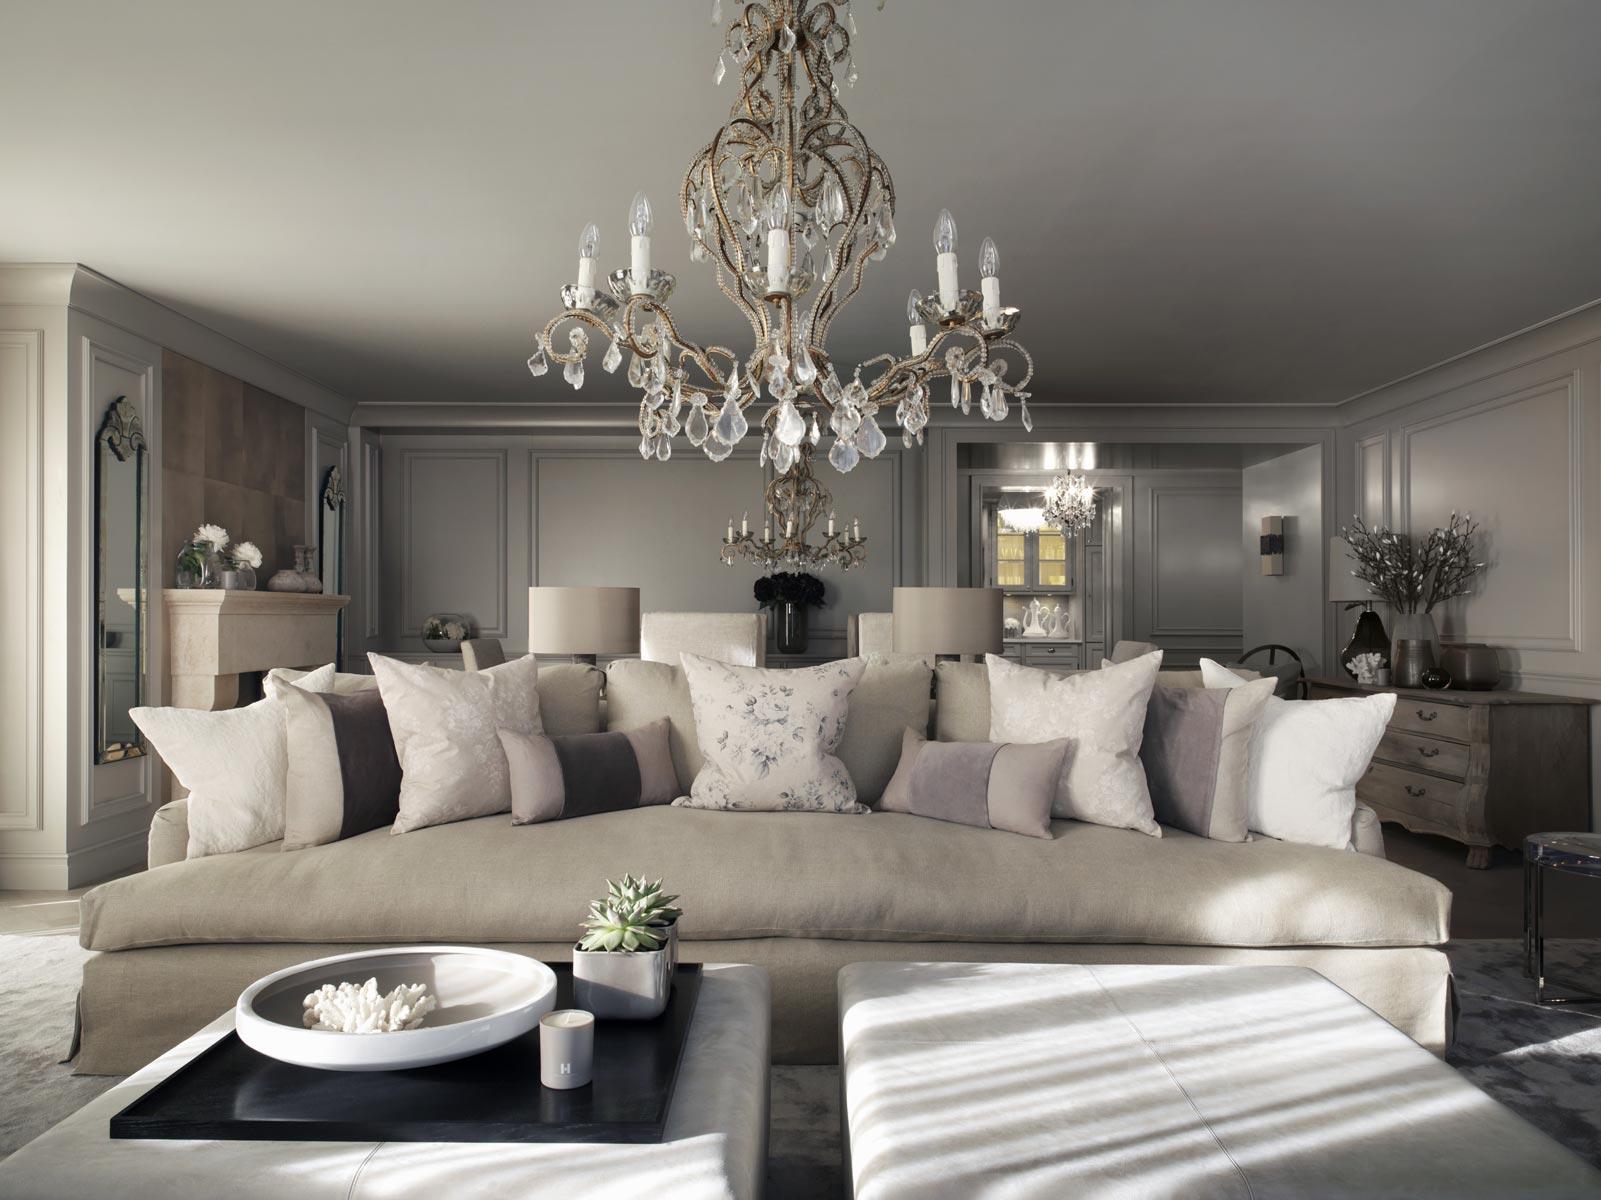 10 Kelly Hoppen Living Room Ideas  kelly hoppen living room ideas 10 Kelly Hoppen Living Room Ideas chalet switzerland